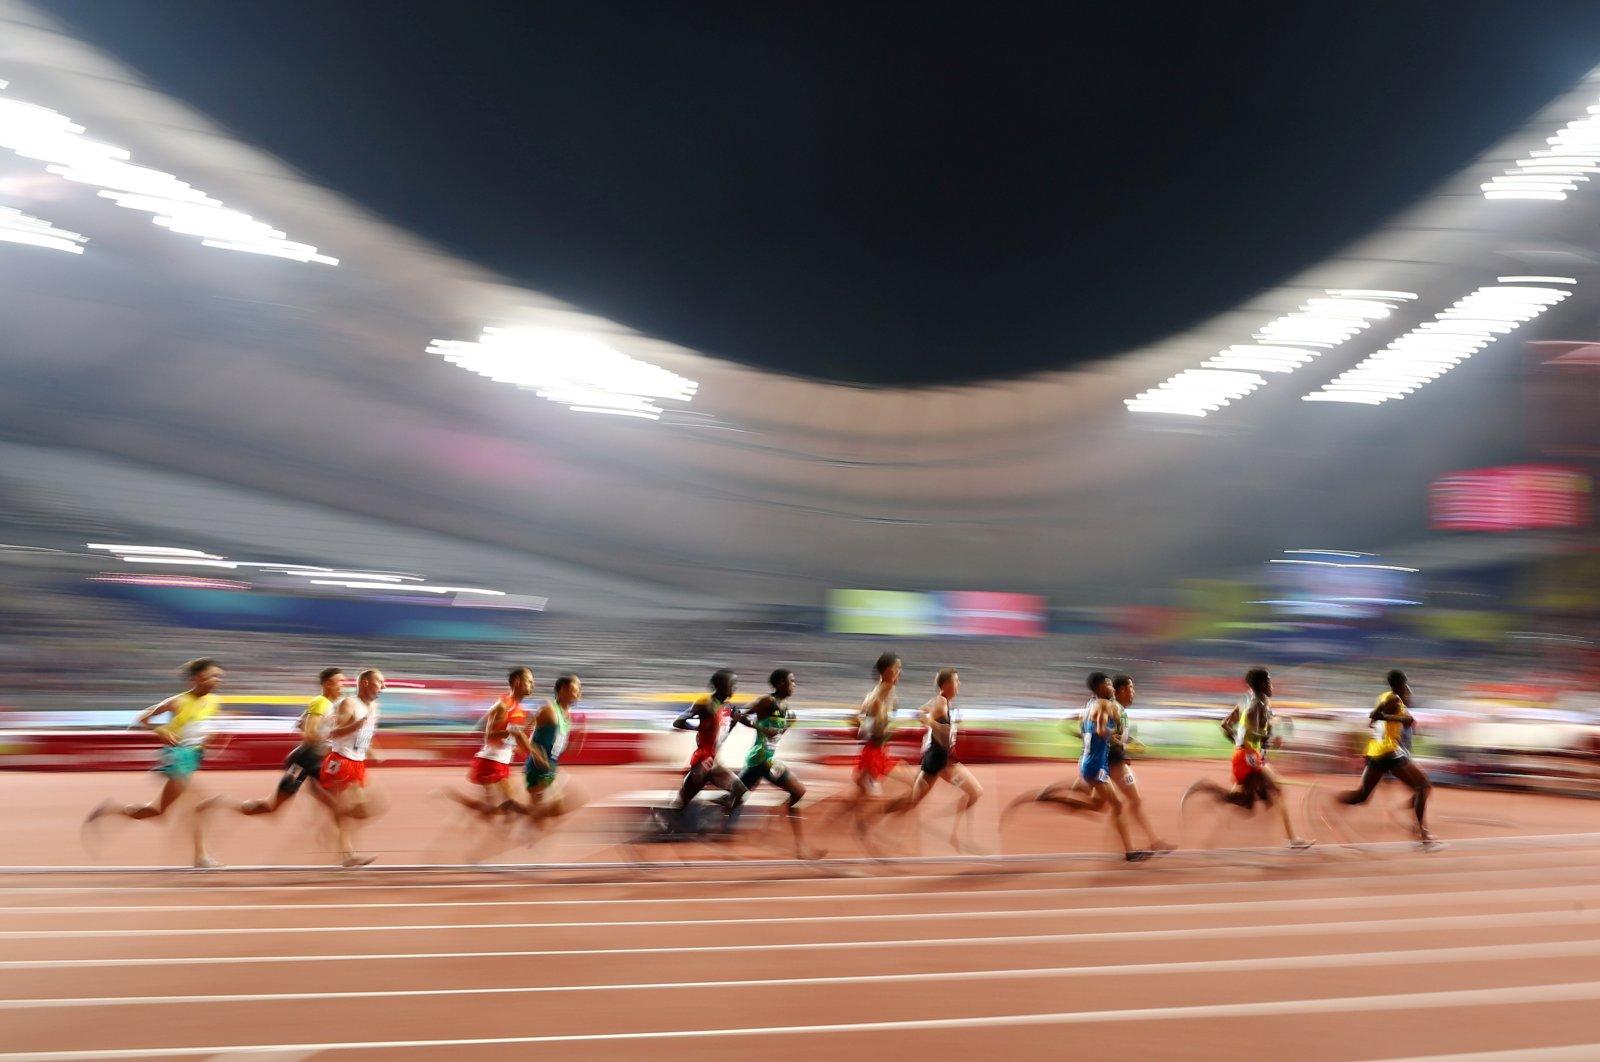 Men compete in 3,000-meter Steeplechase Heats competition in the World Athletics Championships in Khalifa International Stadium, Doha, Qatar, Oct. 1, 2019. (Reuters Photo)